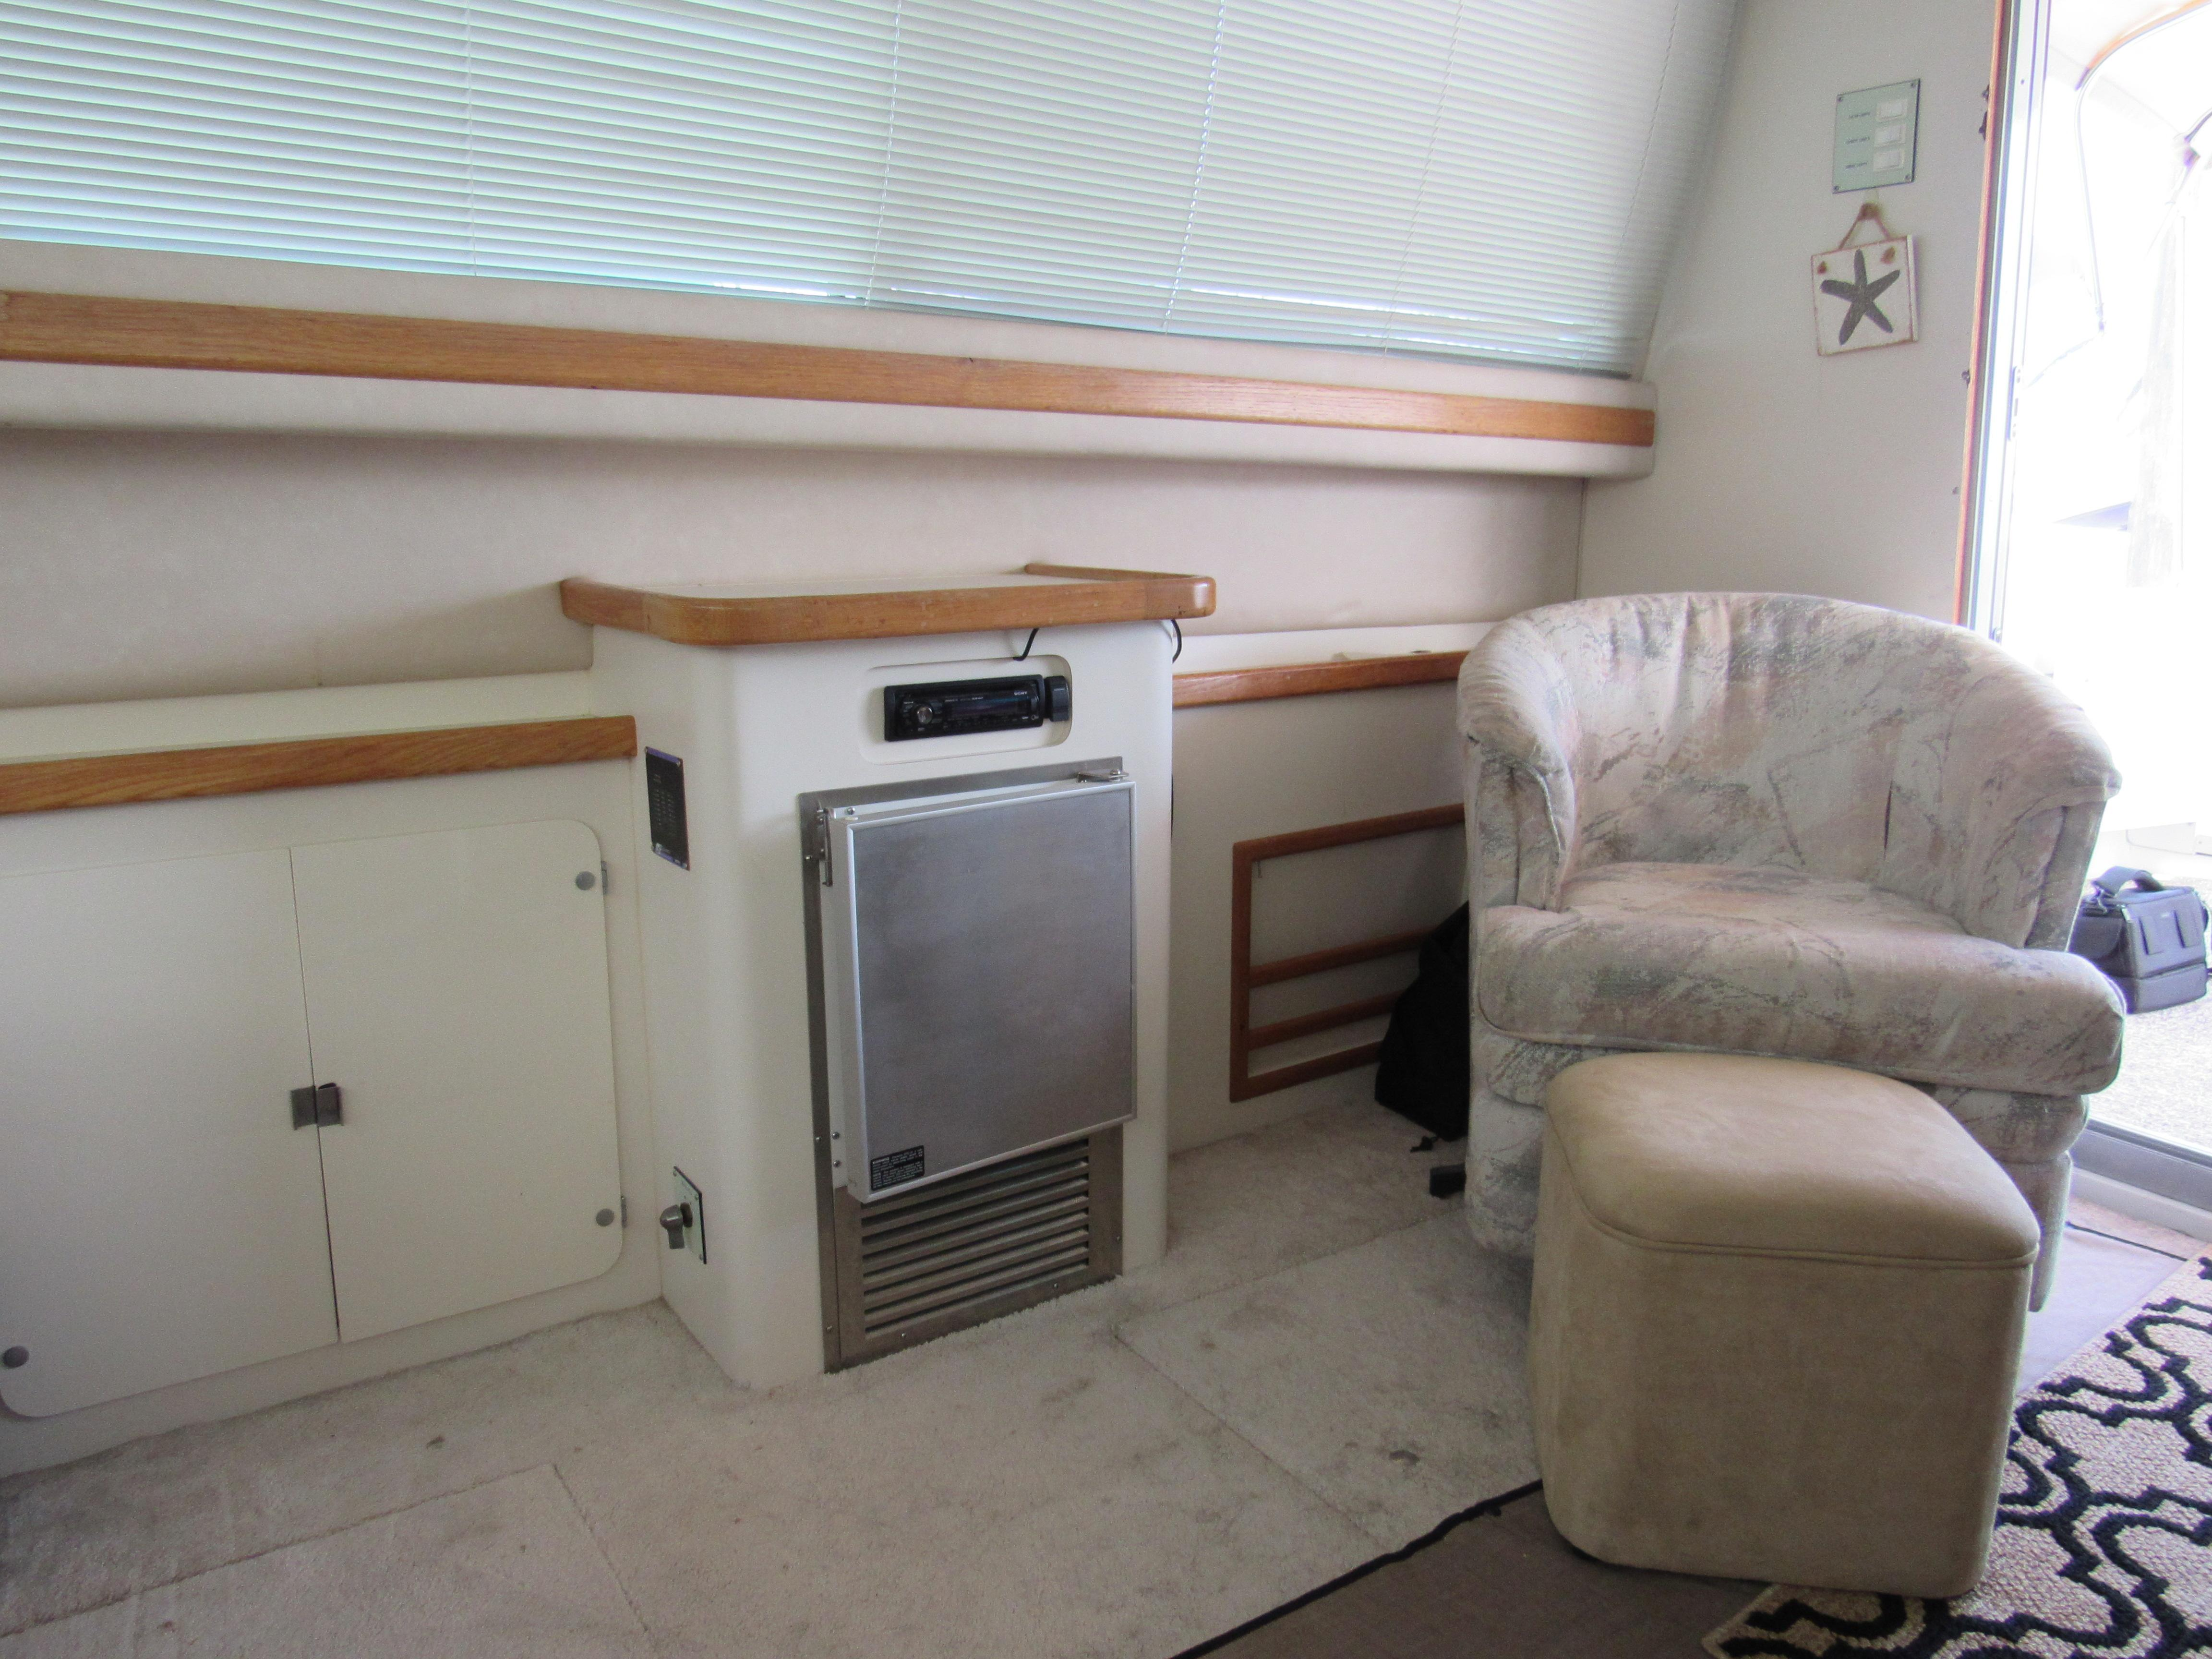 Salon Chair, Ice Maker